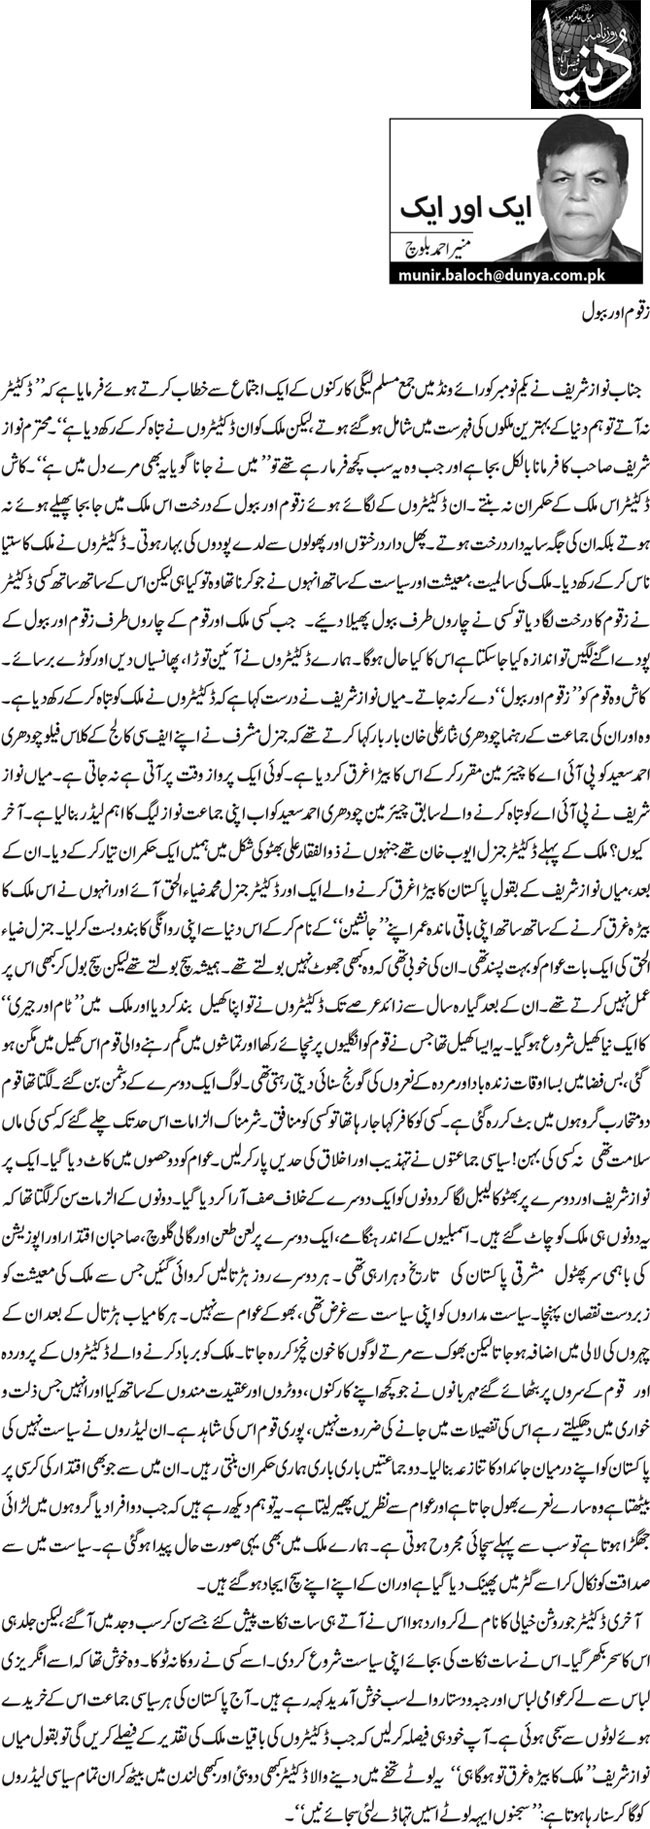 Zakoom aur Babool - Munir AHmed Baloch